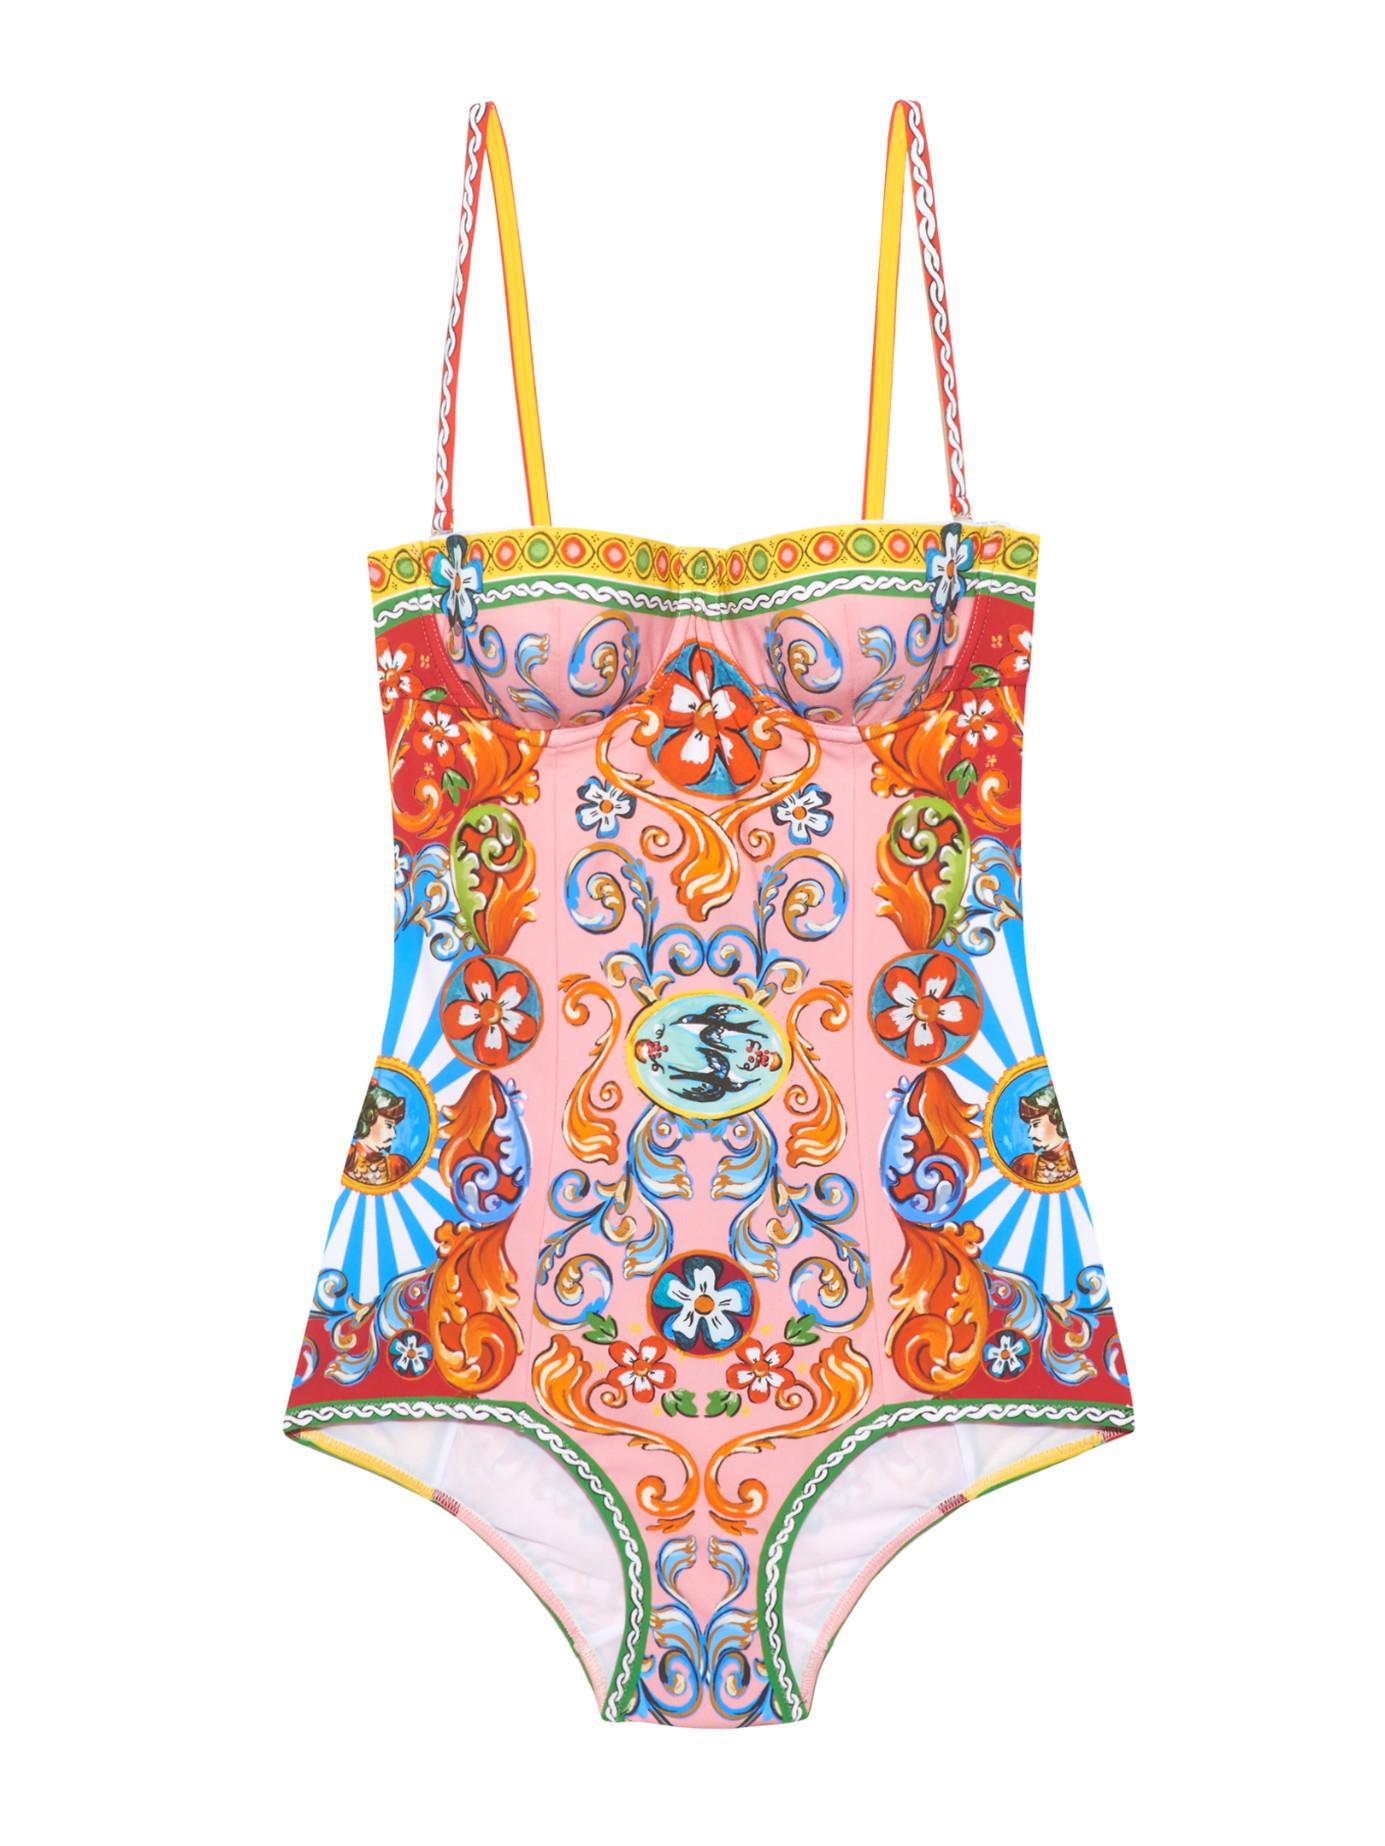 1f3482b7a7 Lyst - Dolce   Gabbana Carretto-print Balconette Swimsuit